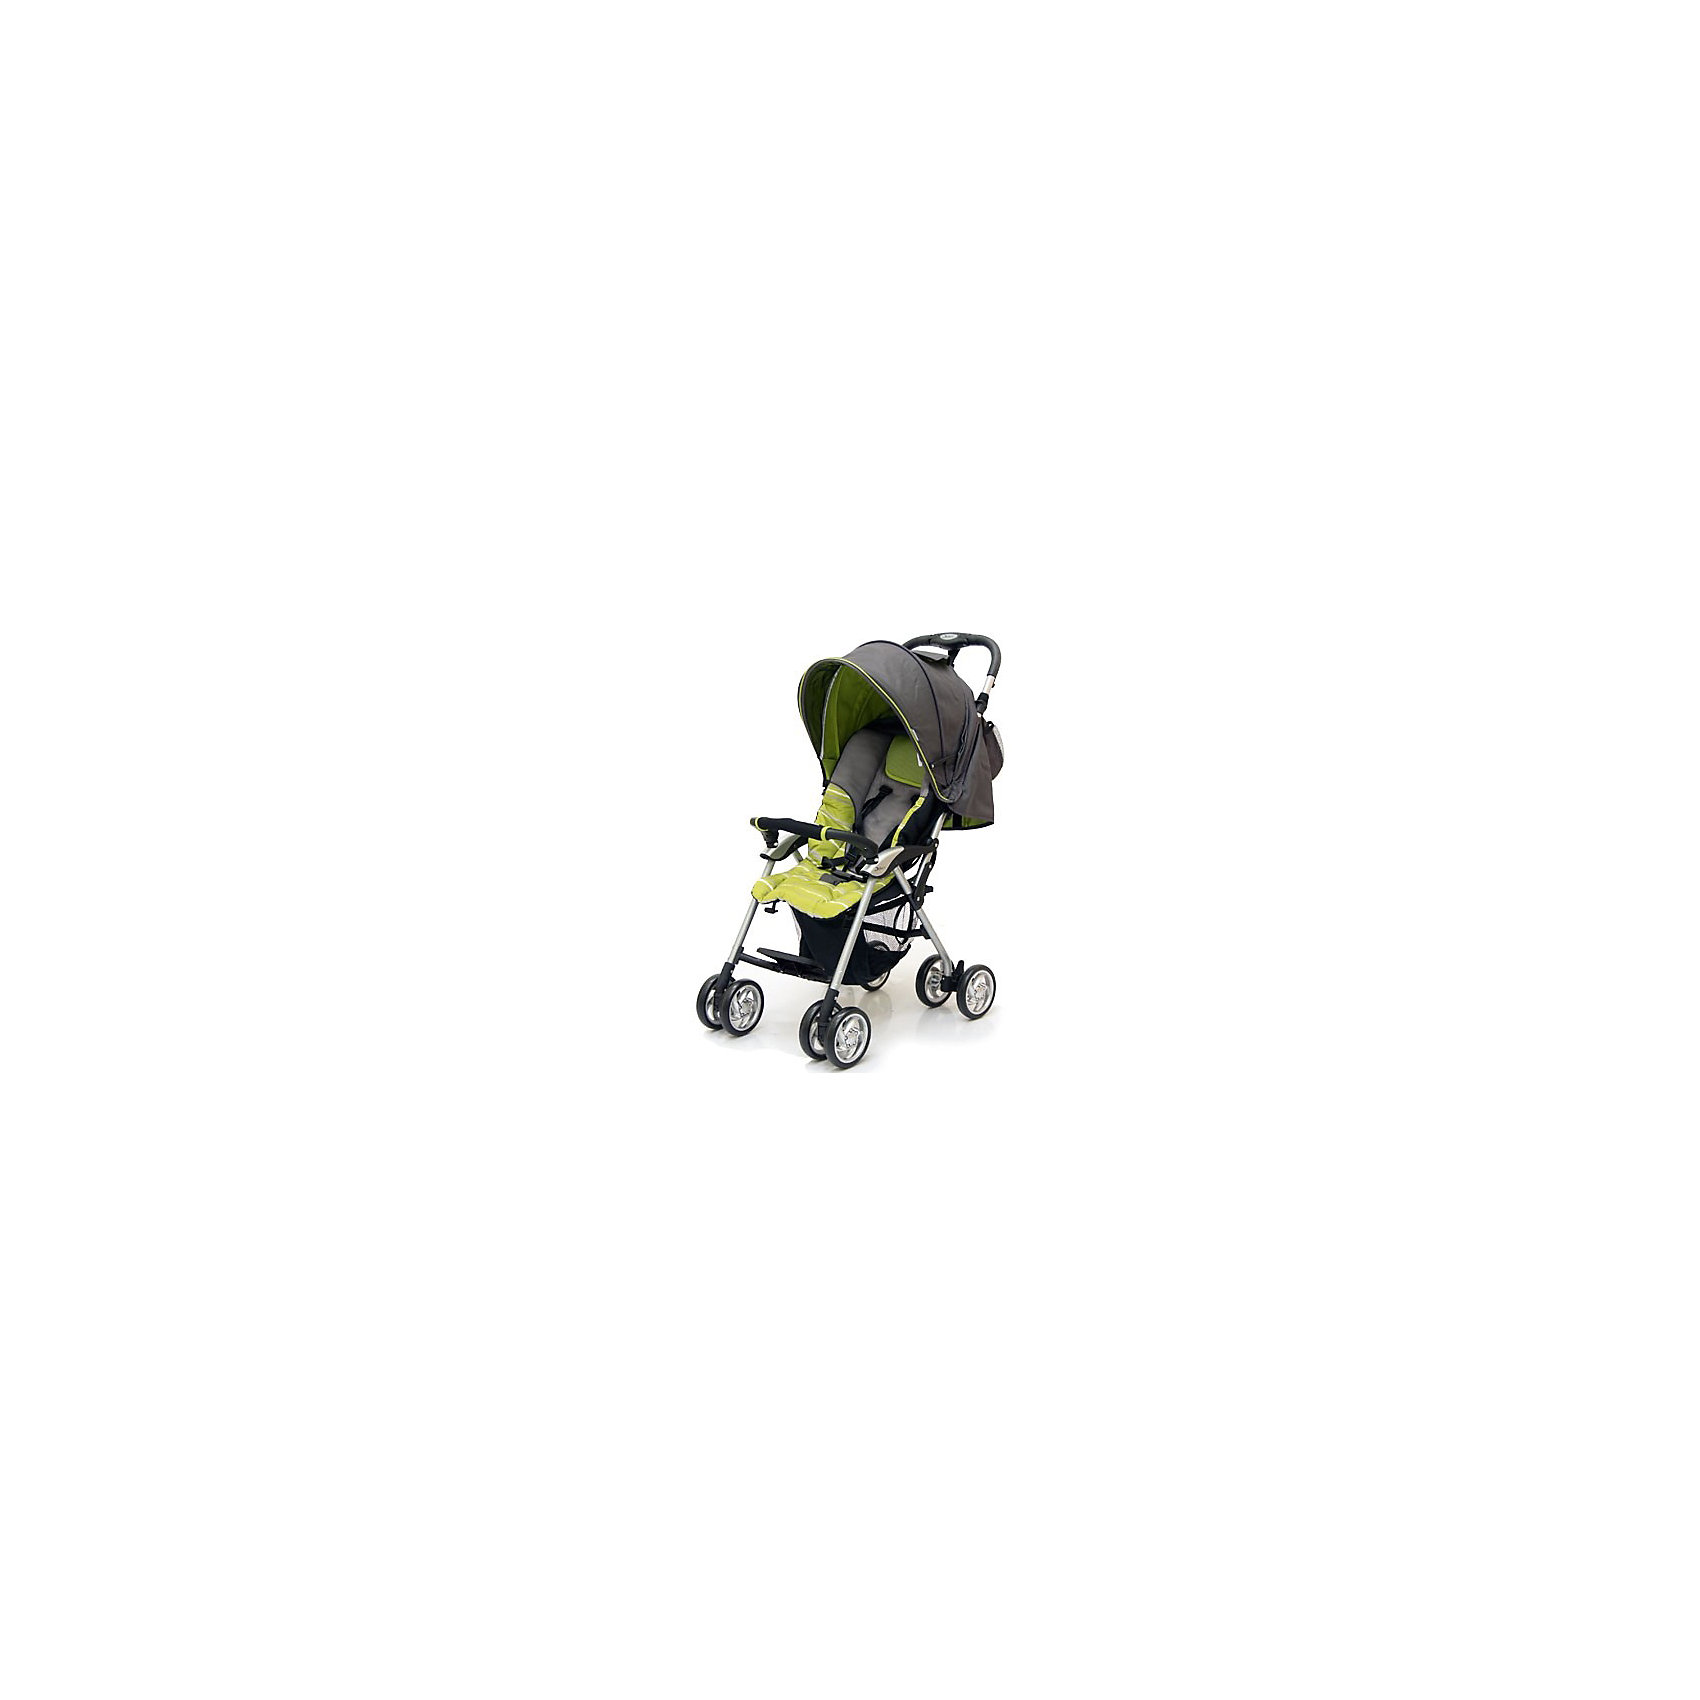 Прогулочная коляска Elegant, Jetem, темно-серый/зеленый